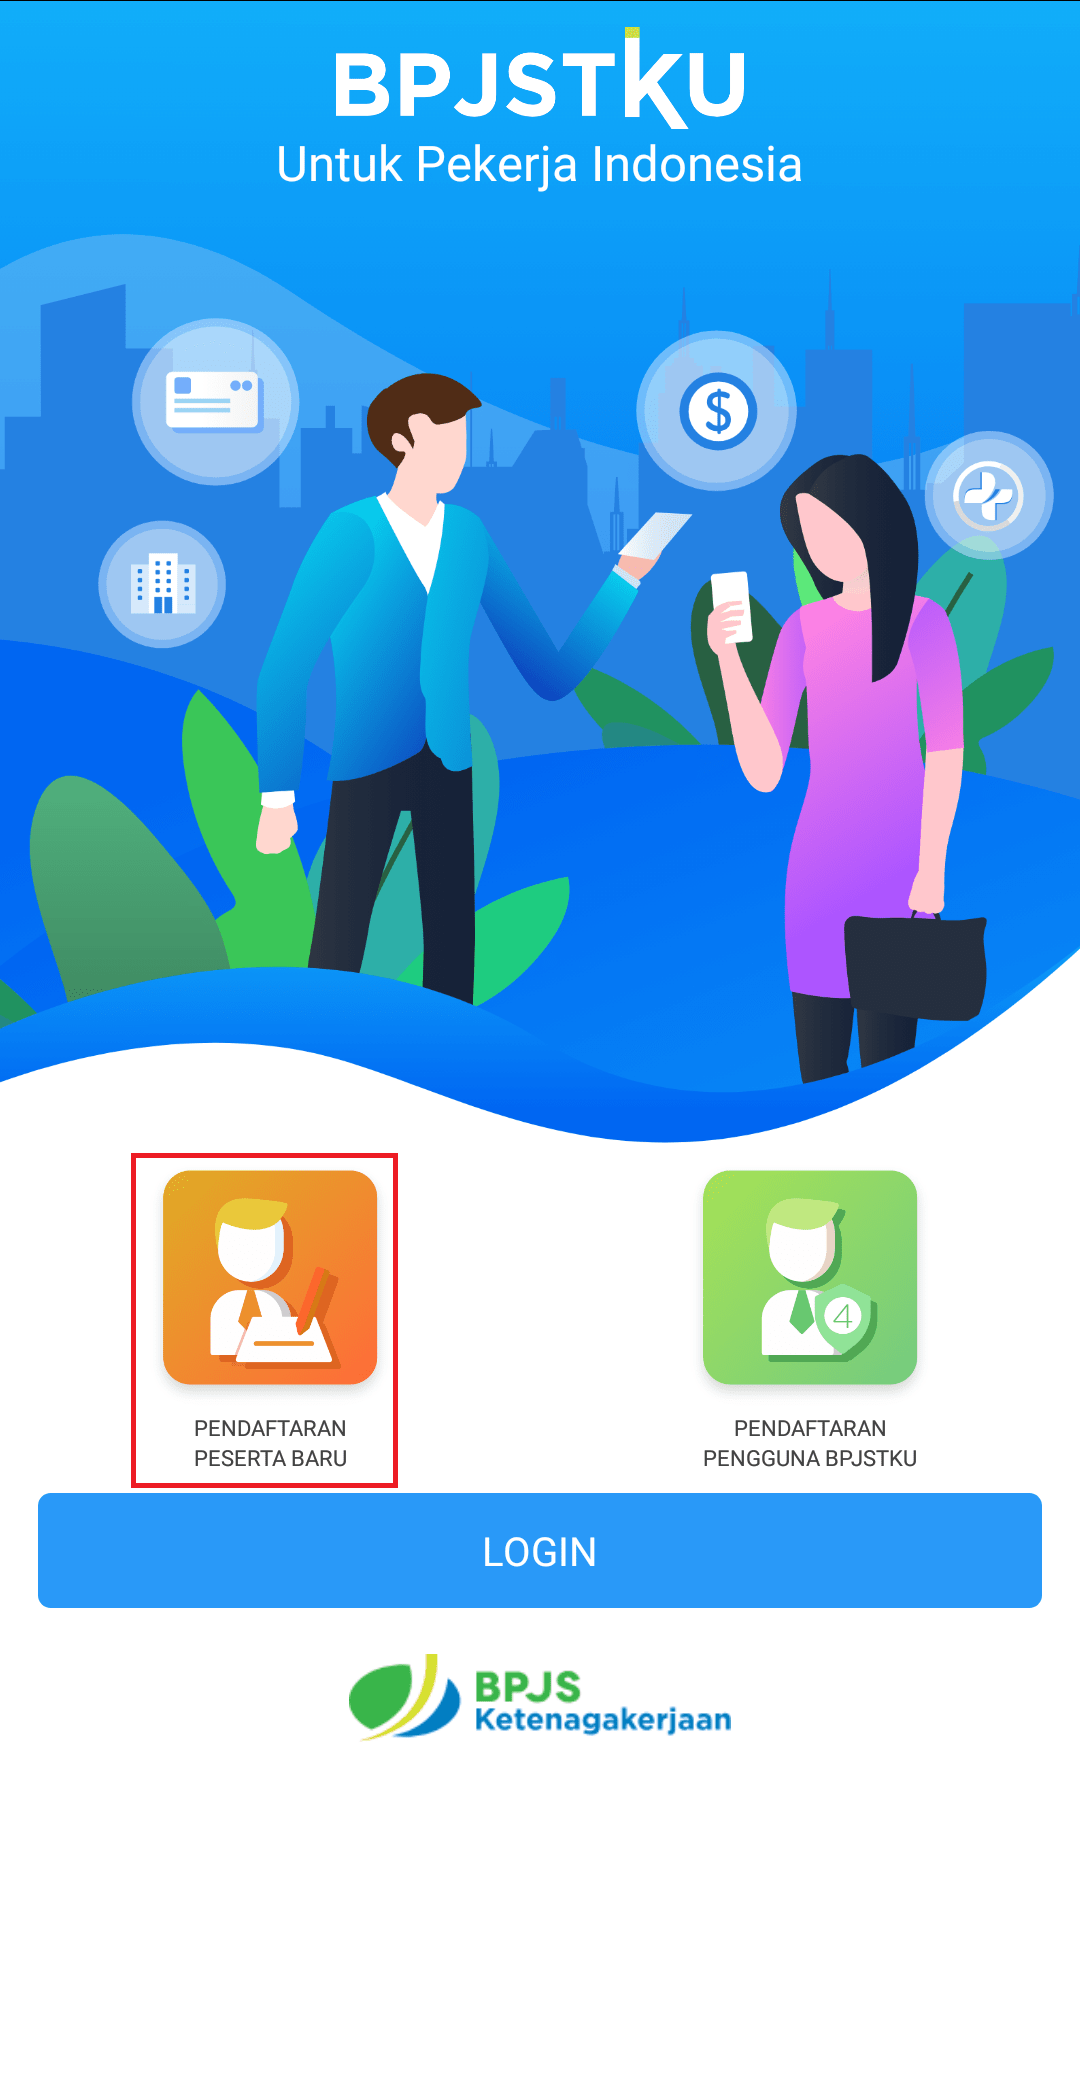 Daftar BPJS Ketenagakerjaan (Aplikasi)